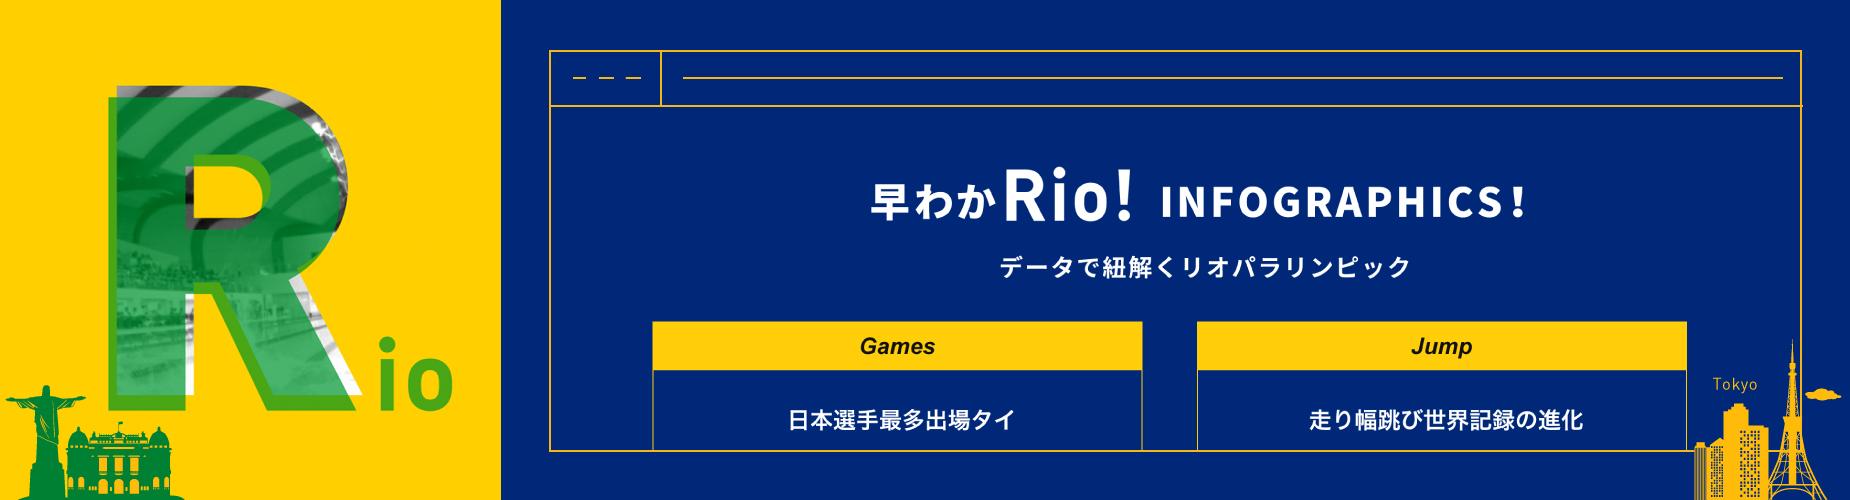 media_rio